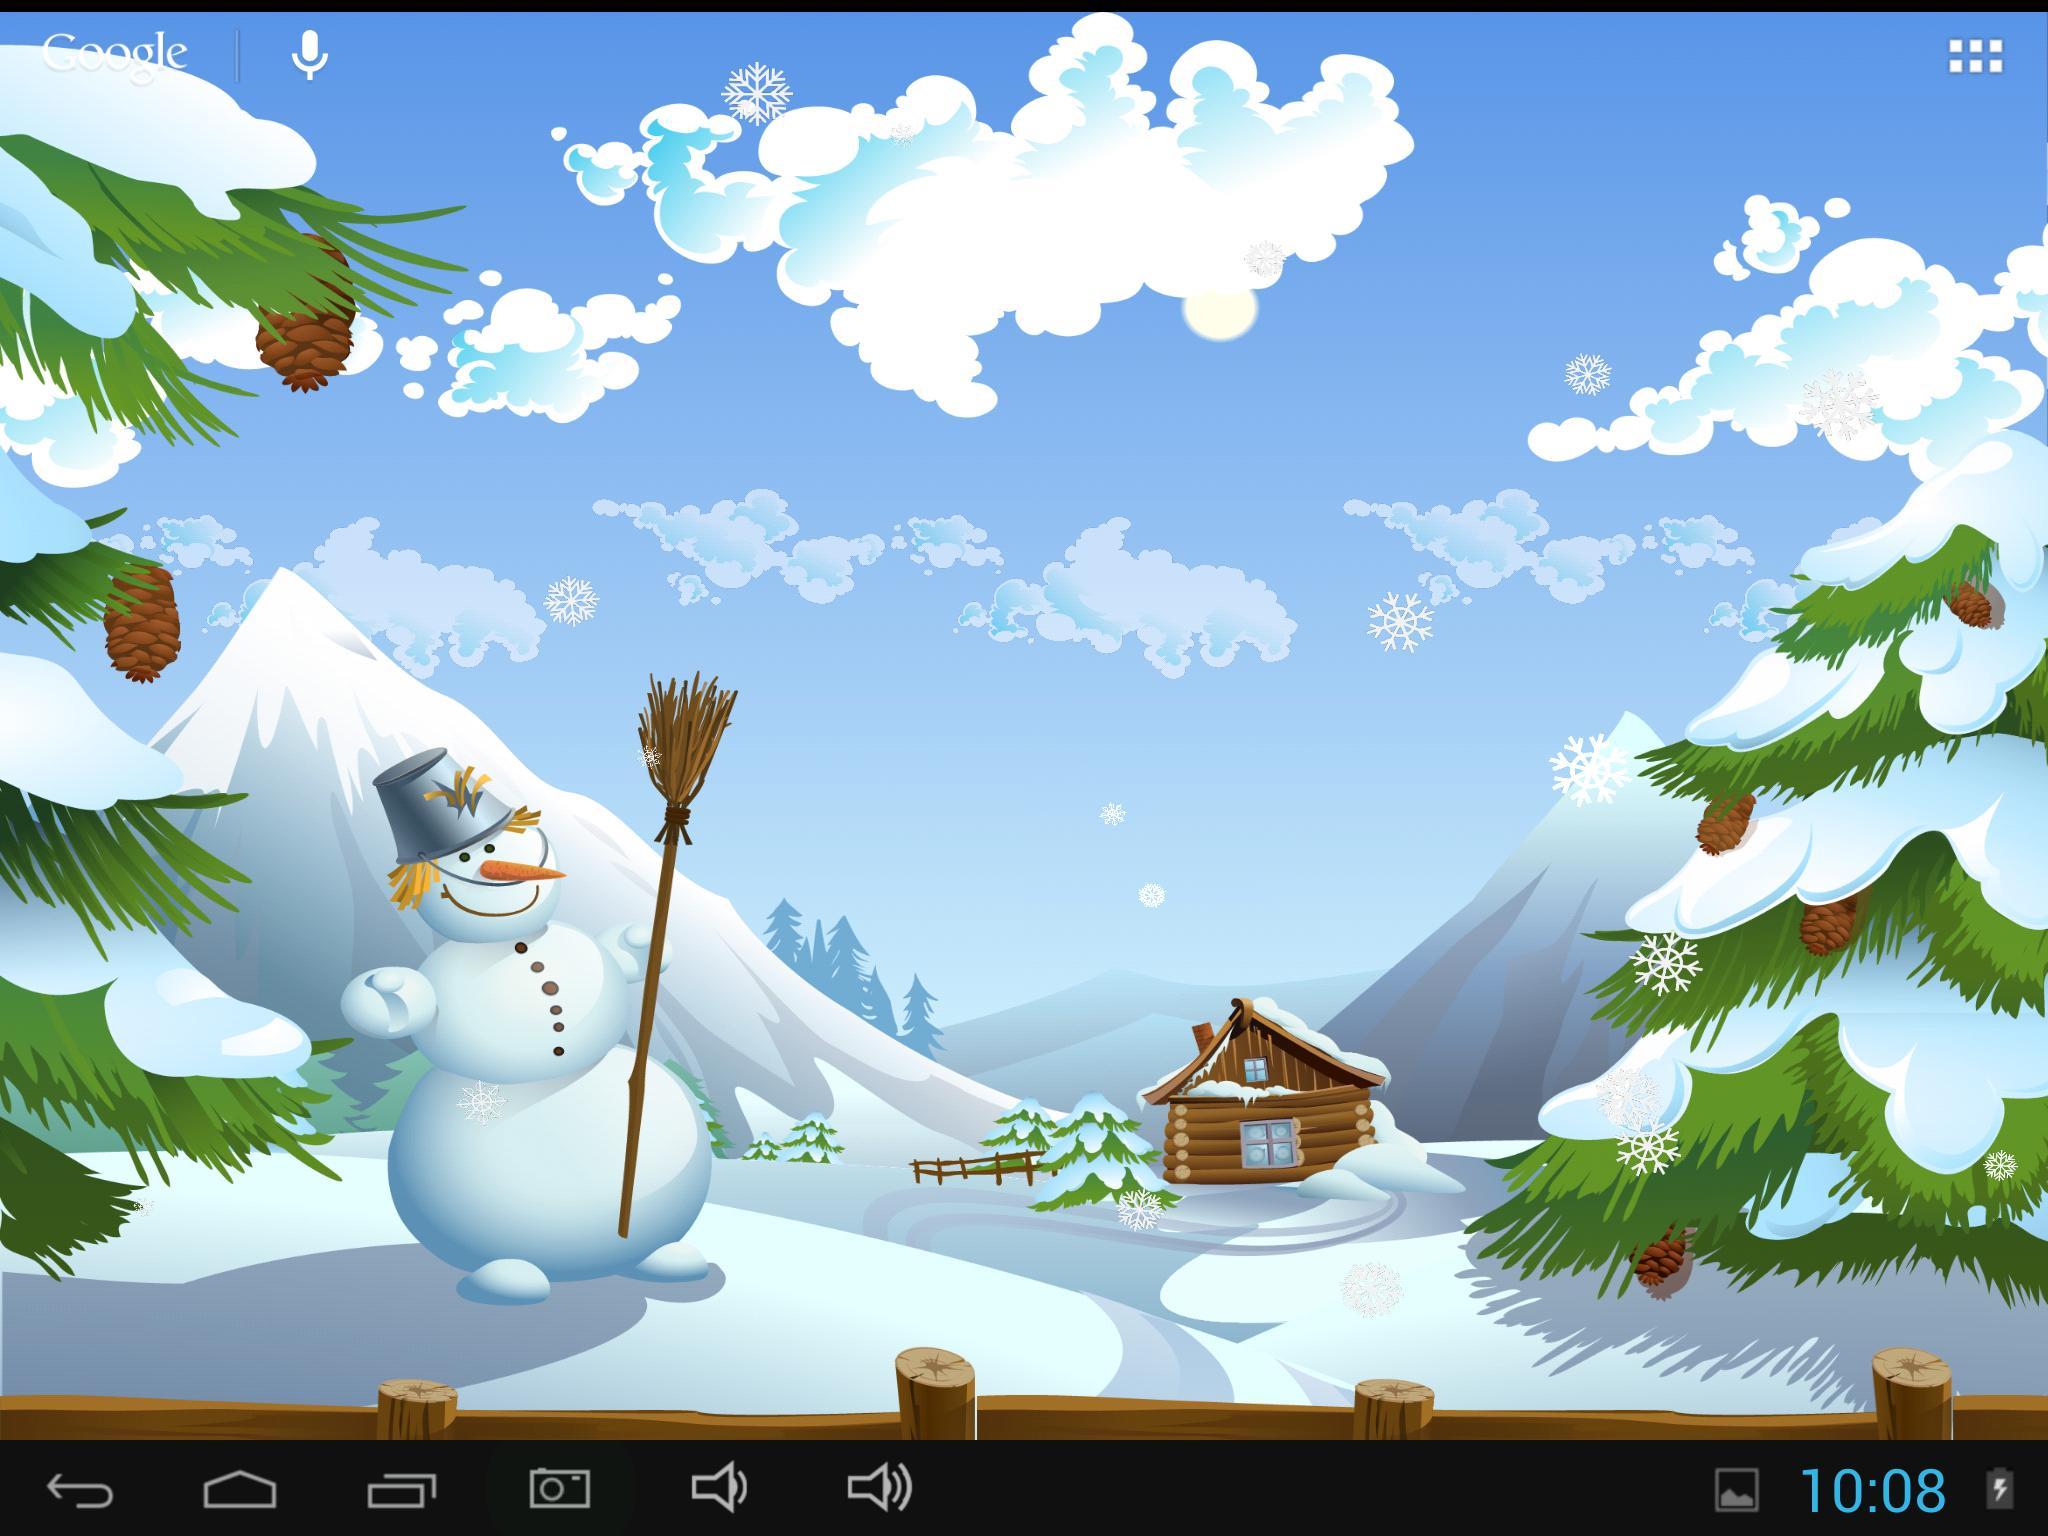 Spring and Easter Live Wallpaper + Tamagotchi Pet screenshot 14